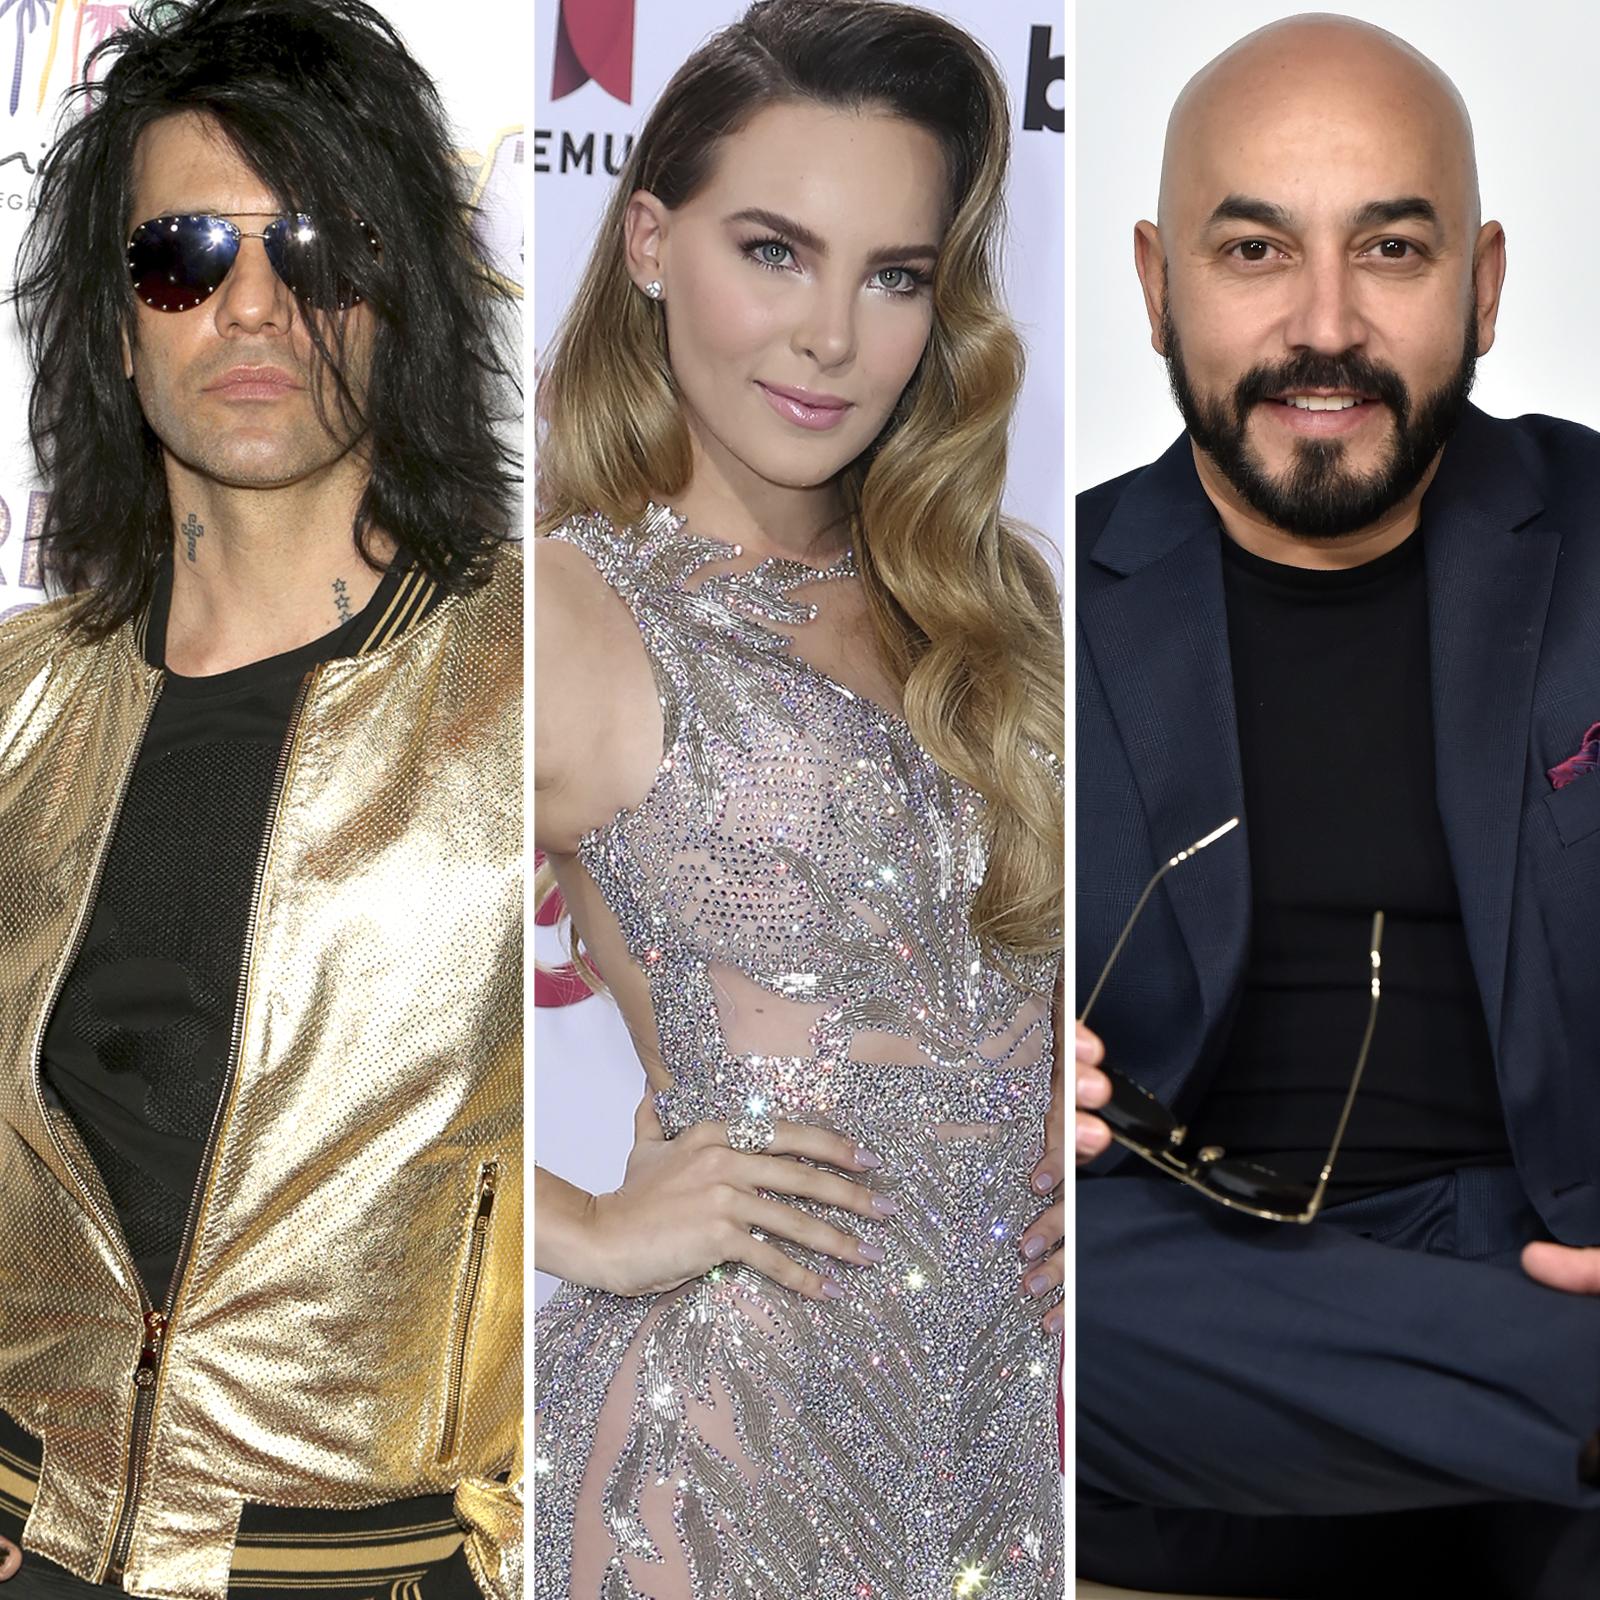 Criss Angel, Belinda y Lupillo Rivera